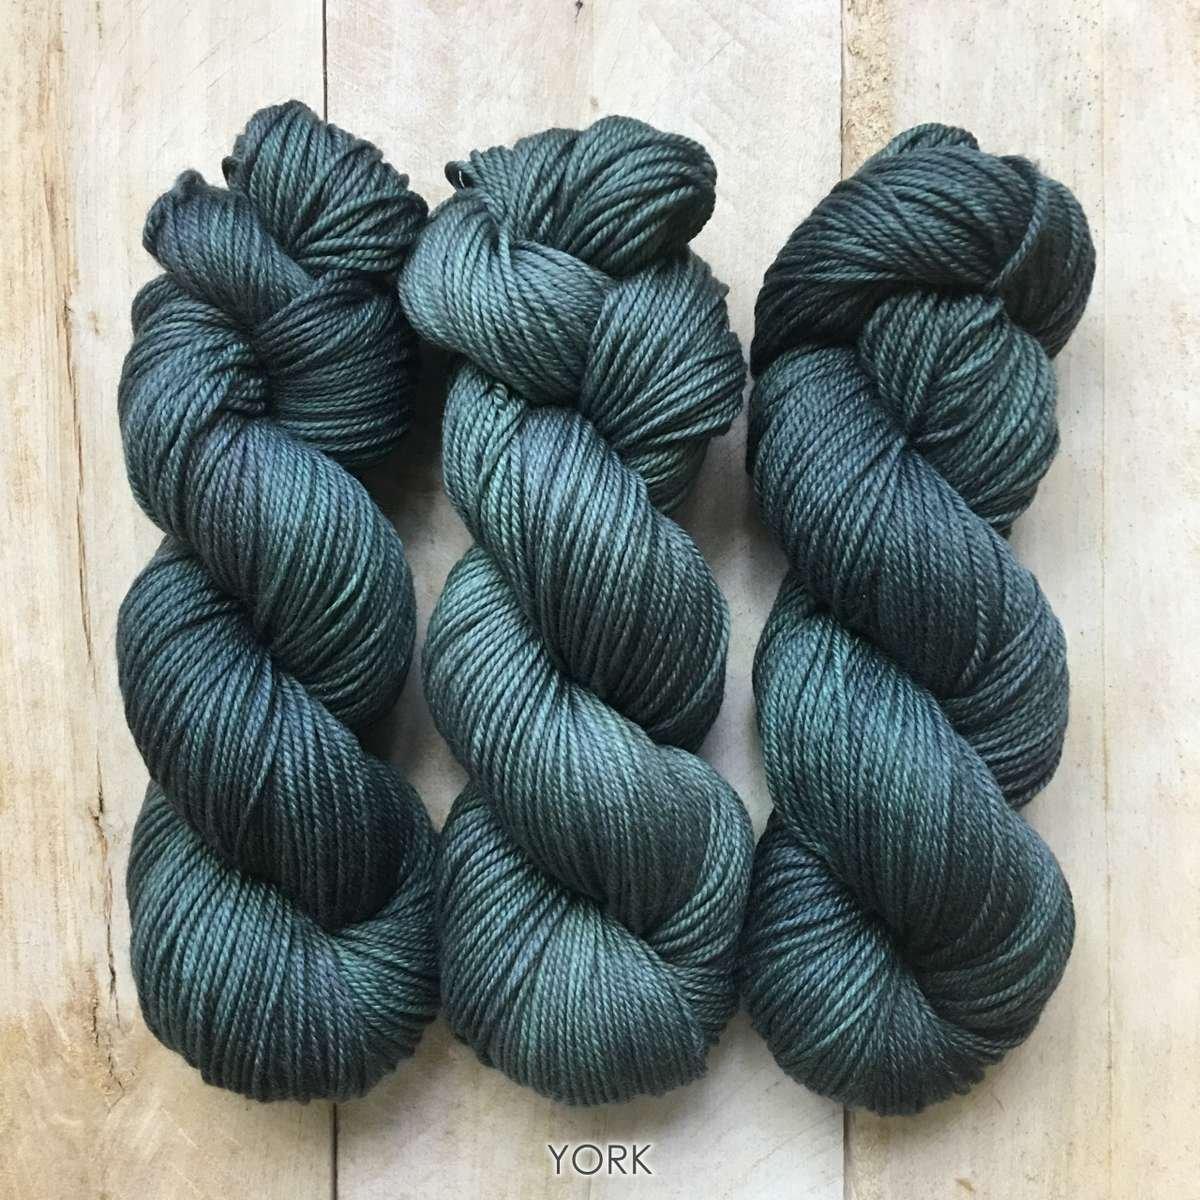 Hand-dyed yarn Louise Robert York